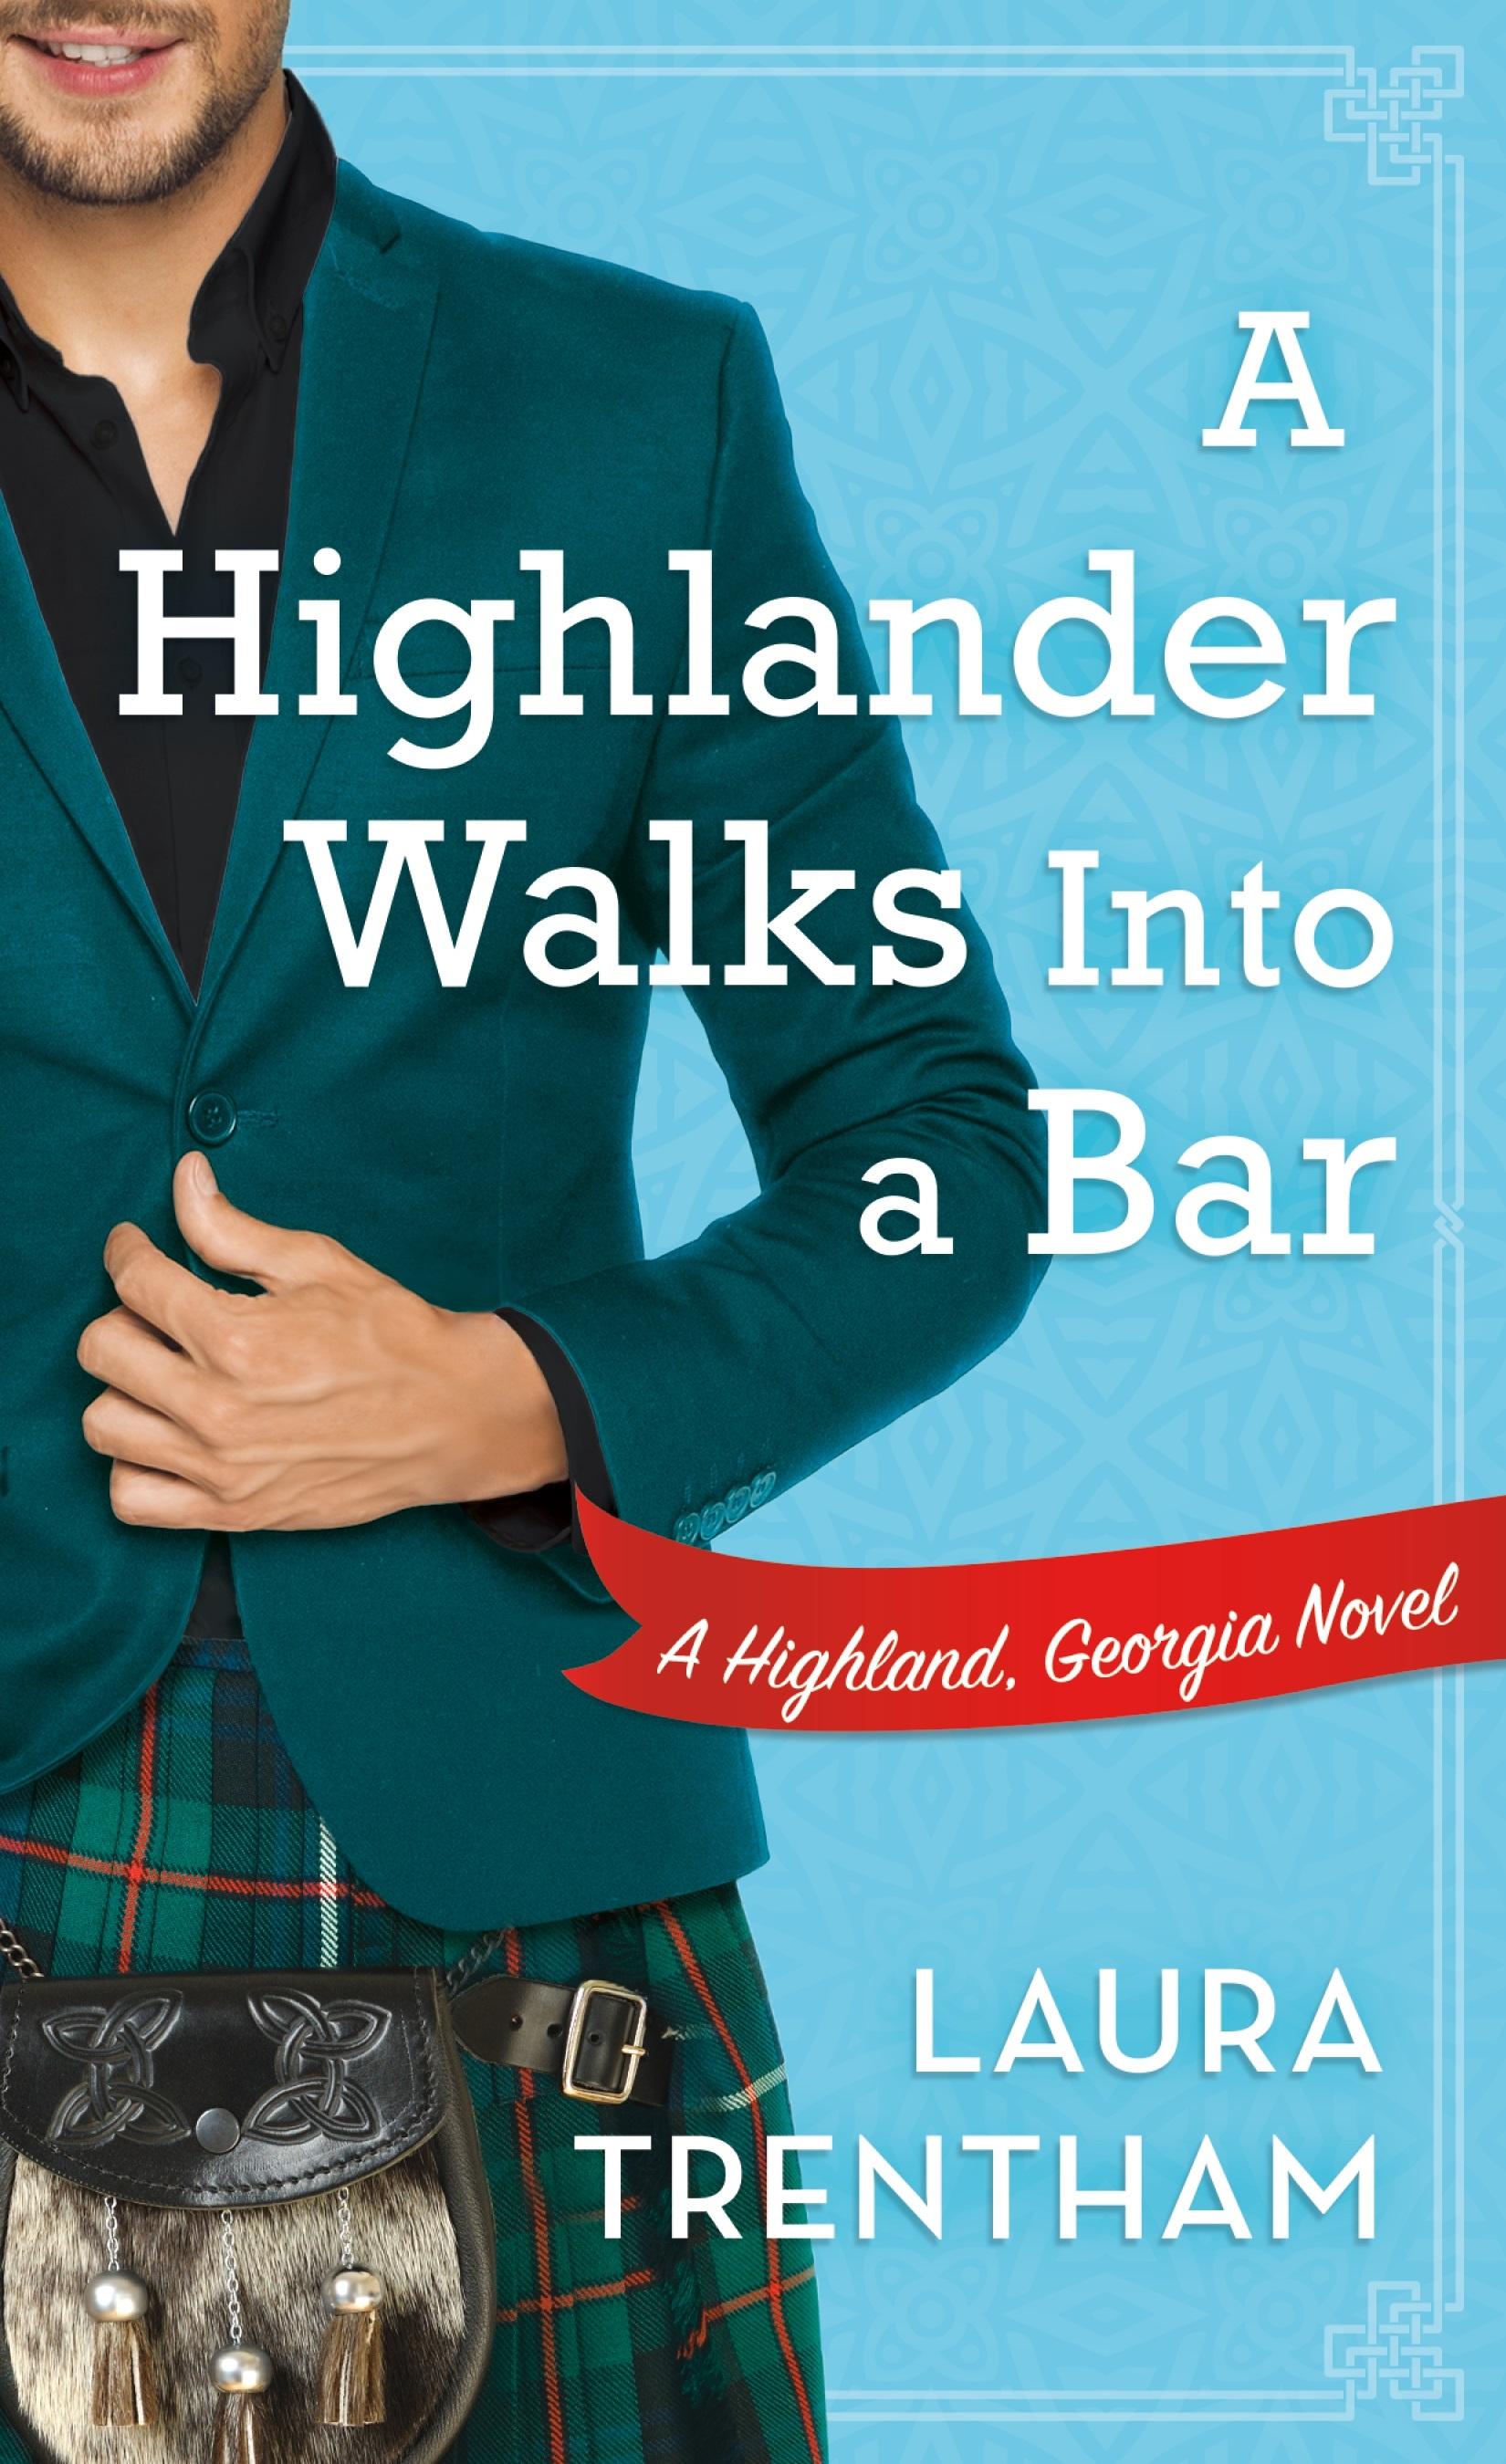 Copy of A Highlander Walks Into a Bar Cover Image